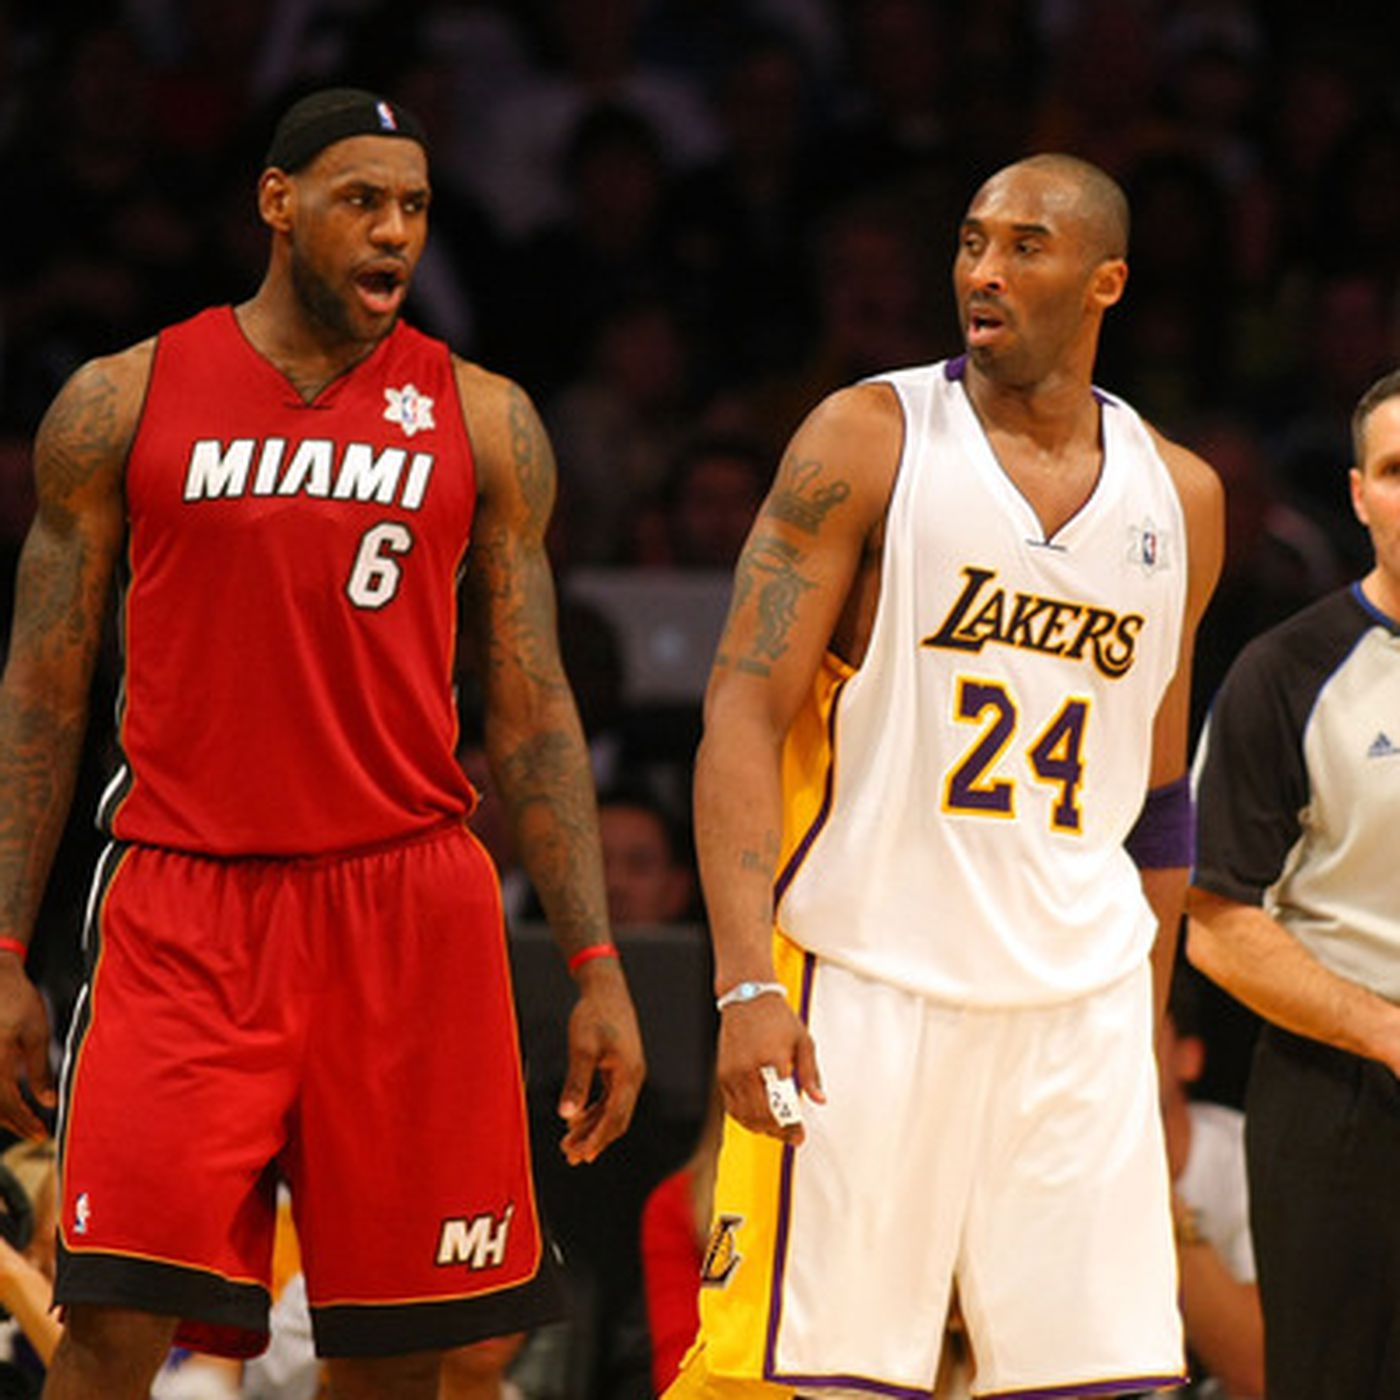 Lakers Vs Heat Kobe Bryant Lebron James Face Off Sbnation Com